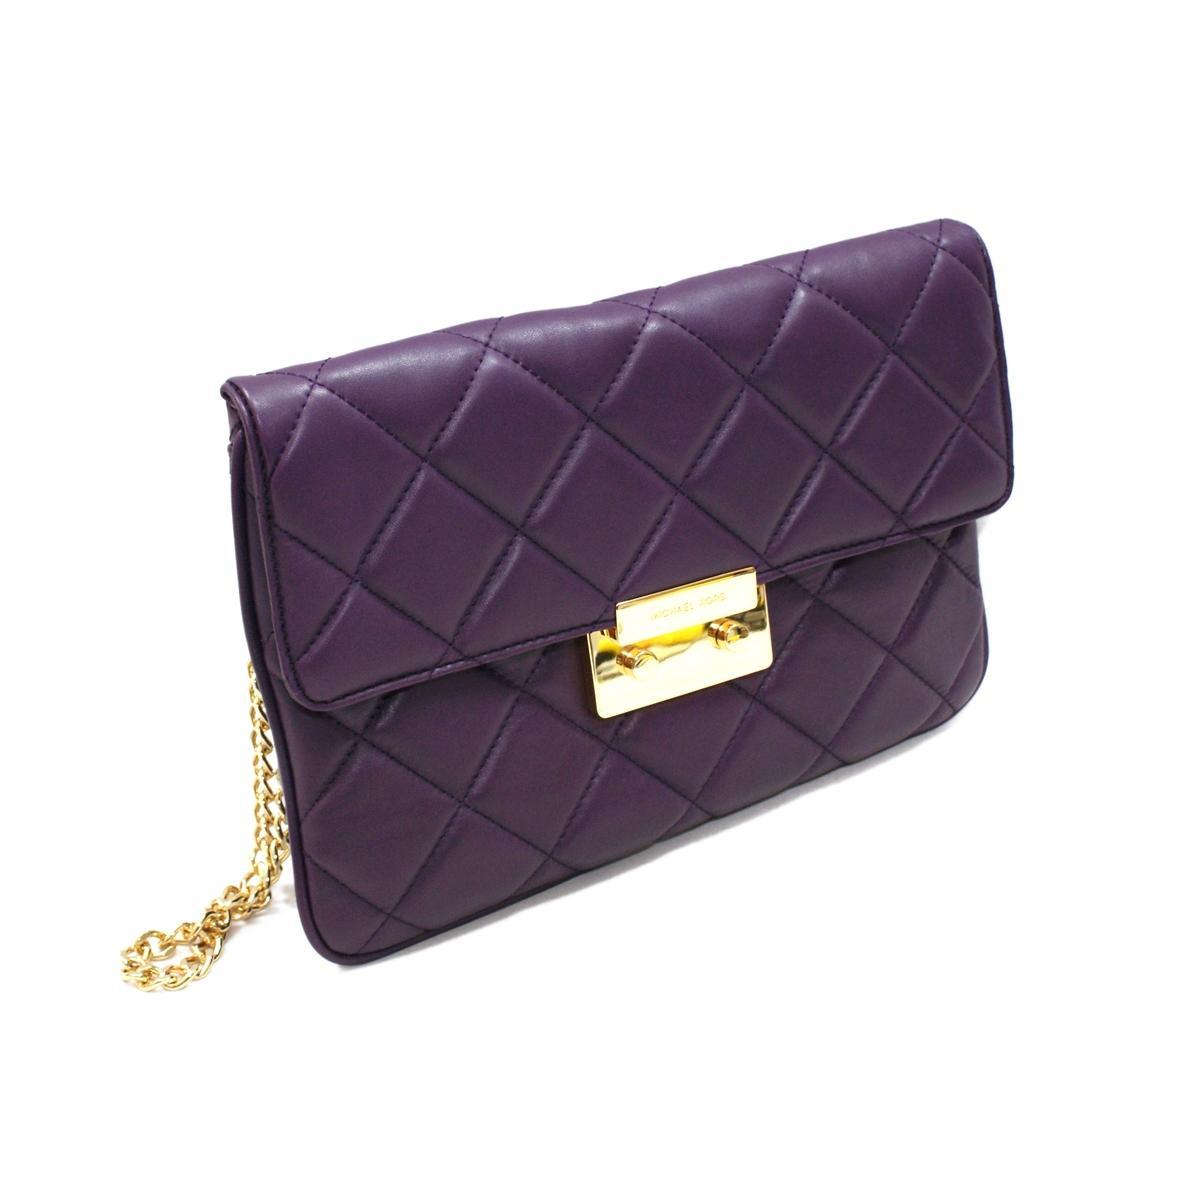 Michael Kors Sloan Quilted Genuine Leather Purple Clutch/ Shoulder Bag ...